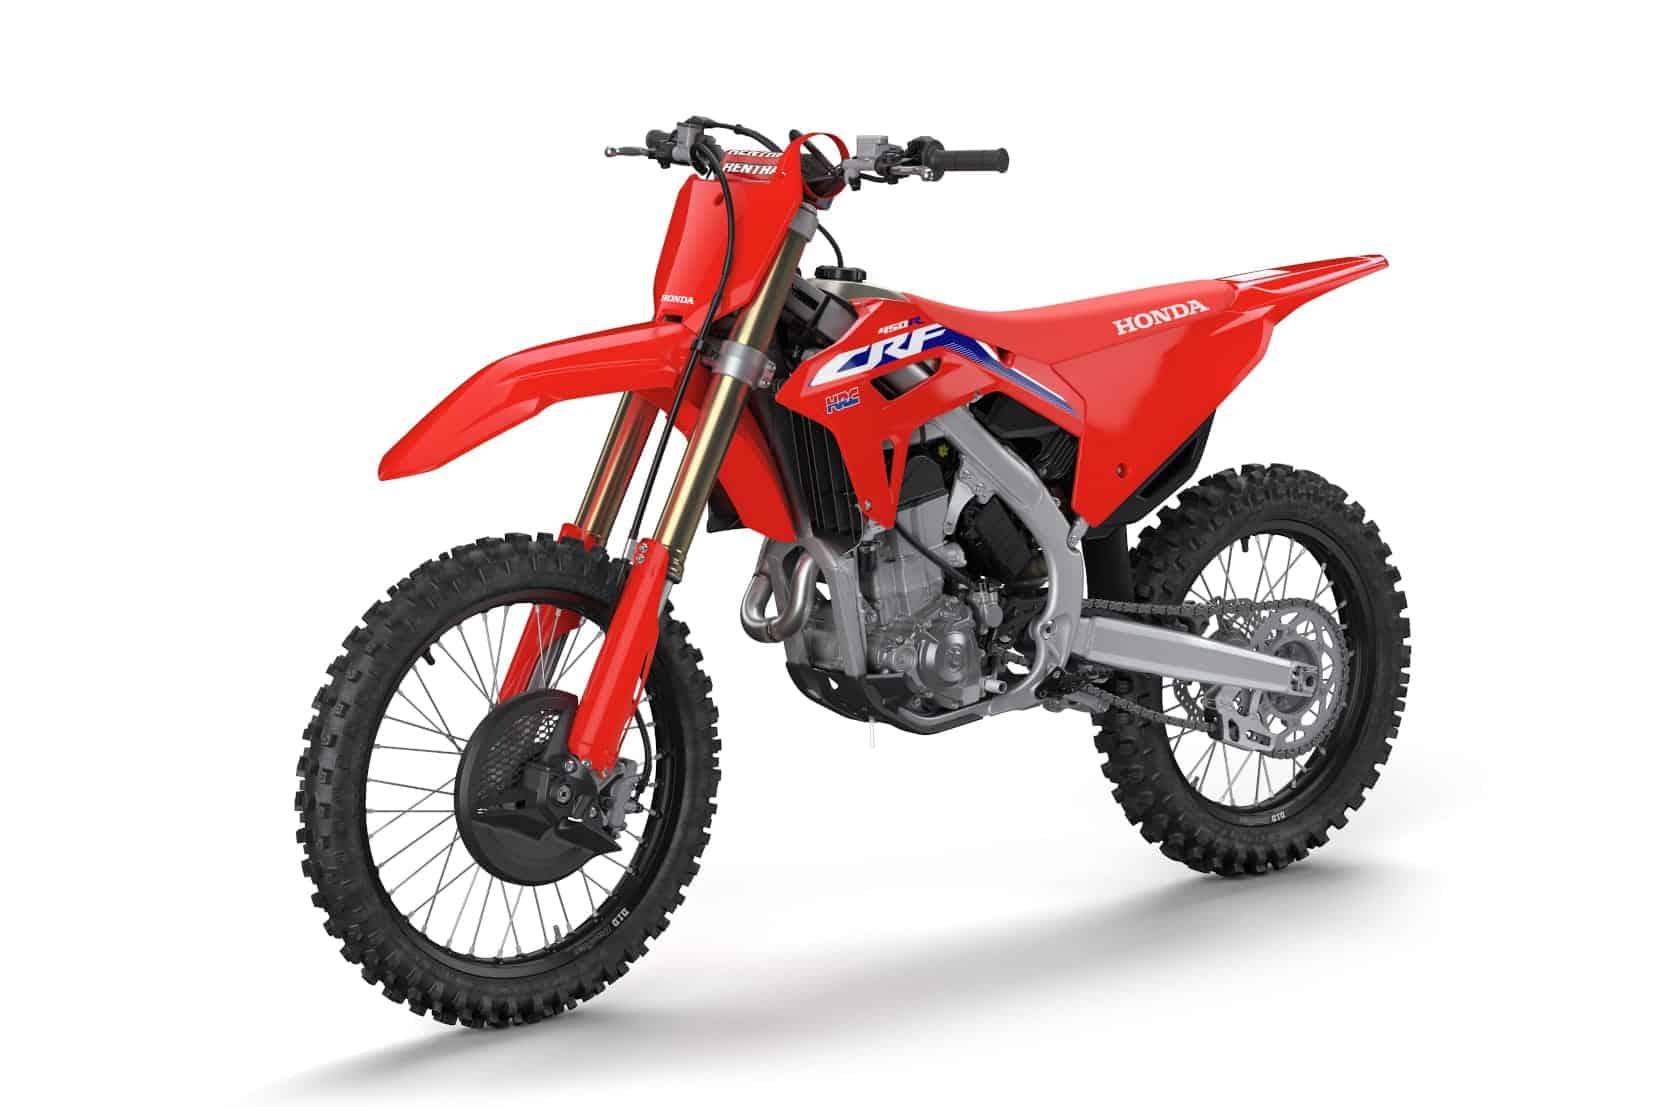 Honda CRF450R Modelljahr 2022